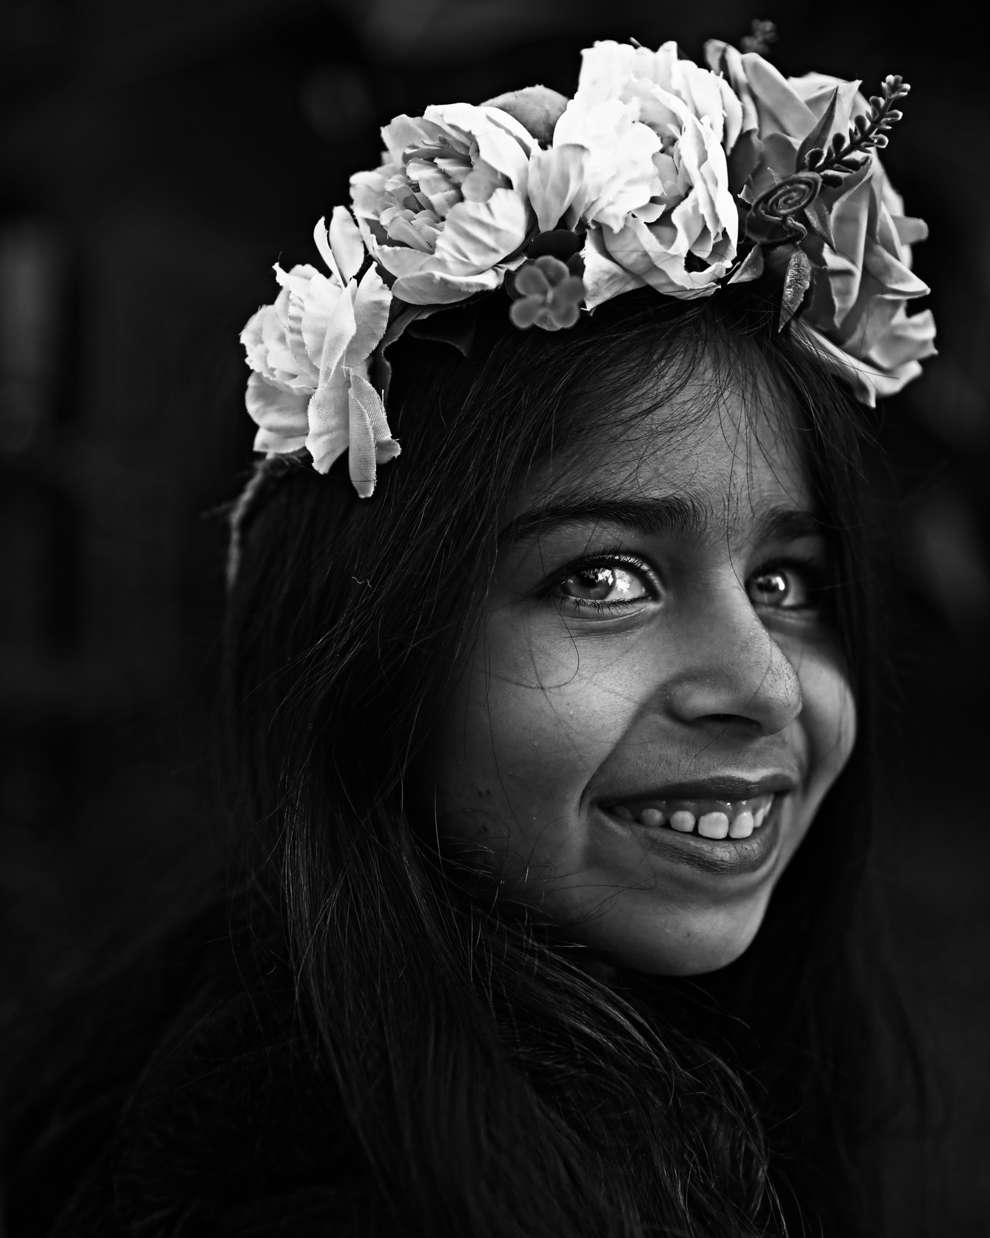 Fatima Almousawi